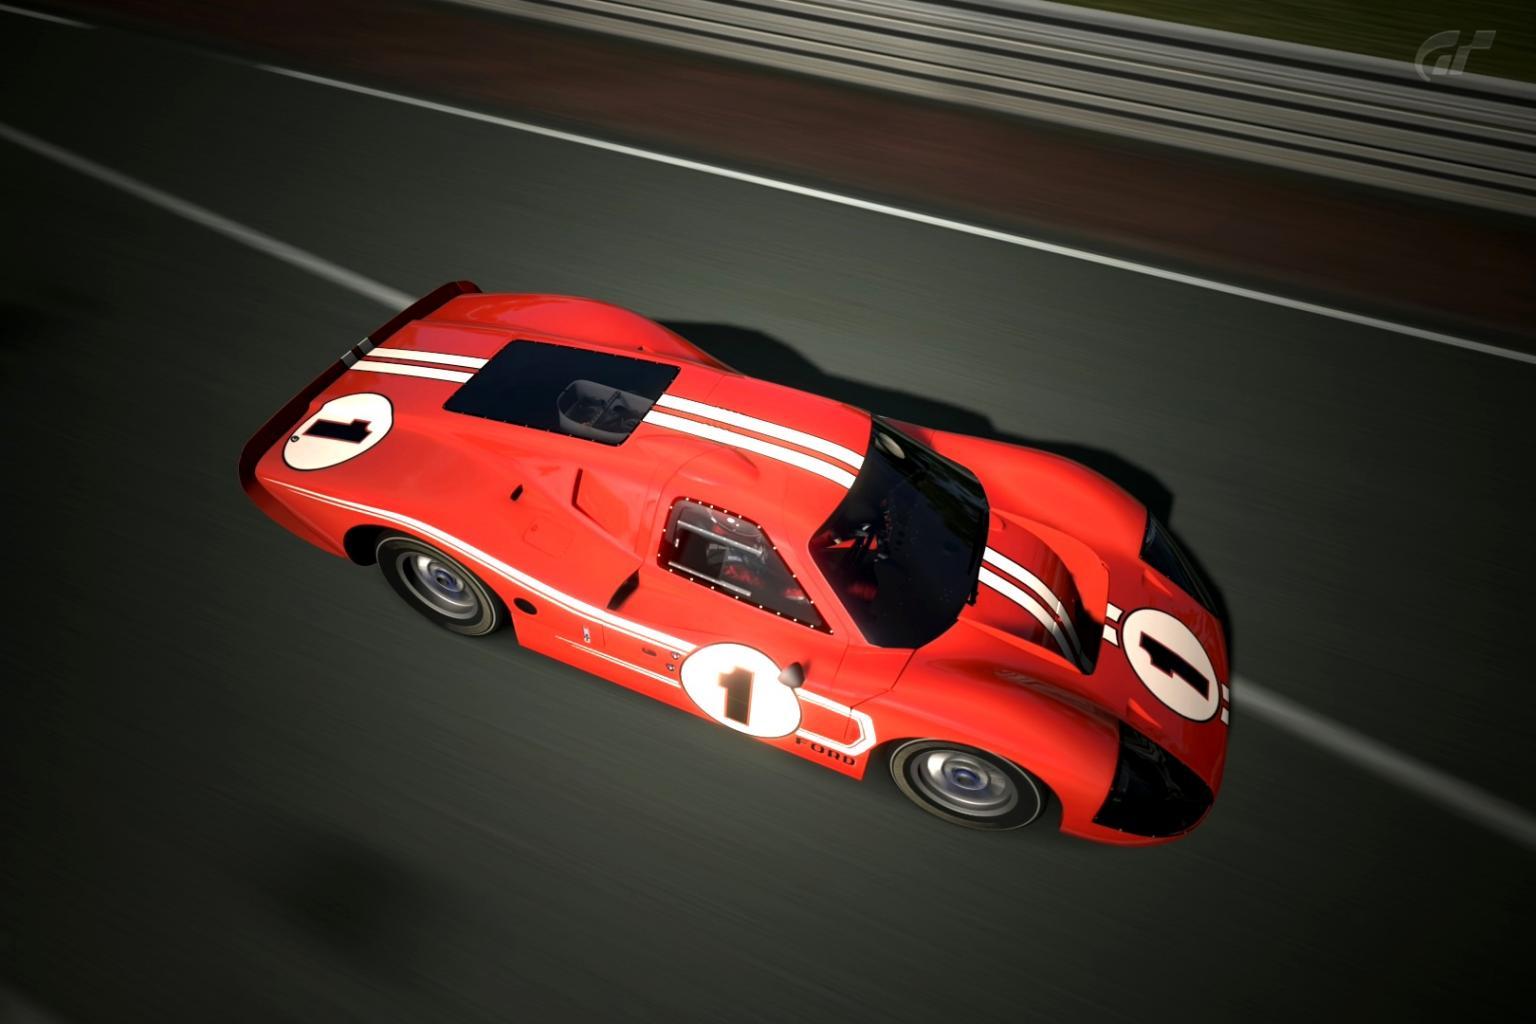 BigB's RCR MKIV-circuit-de-la-sarthe-2005-no-chicanes-_7-jpg